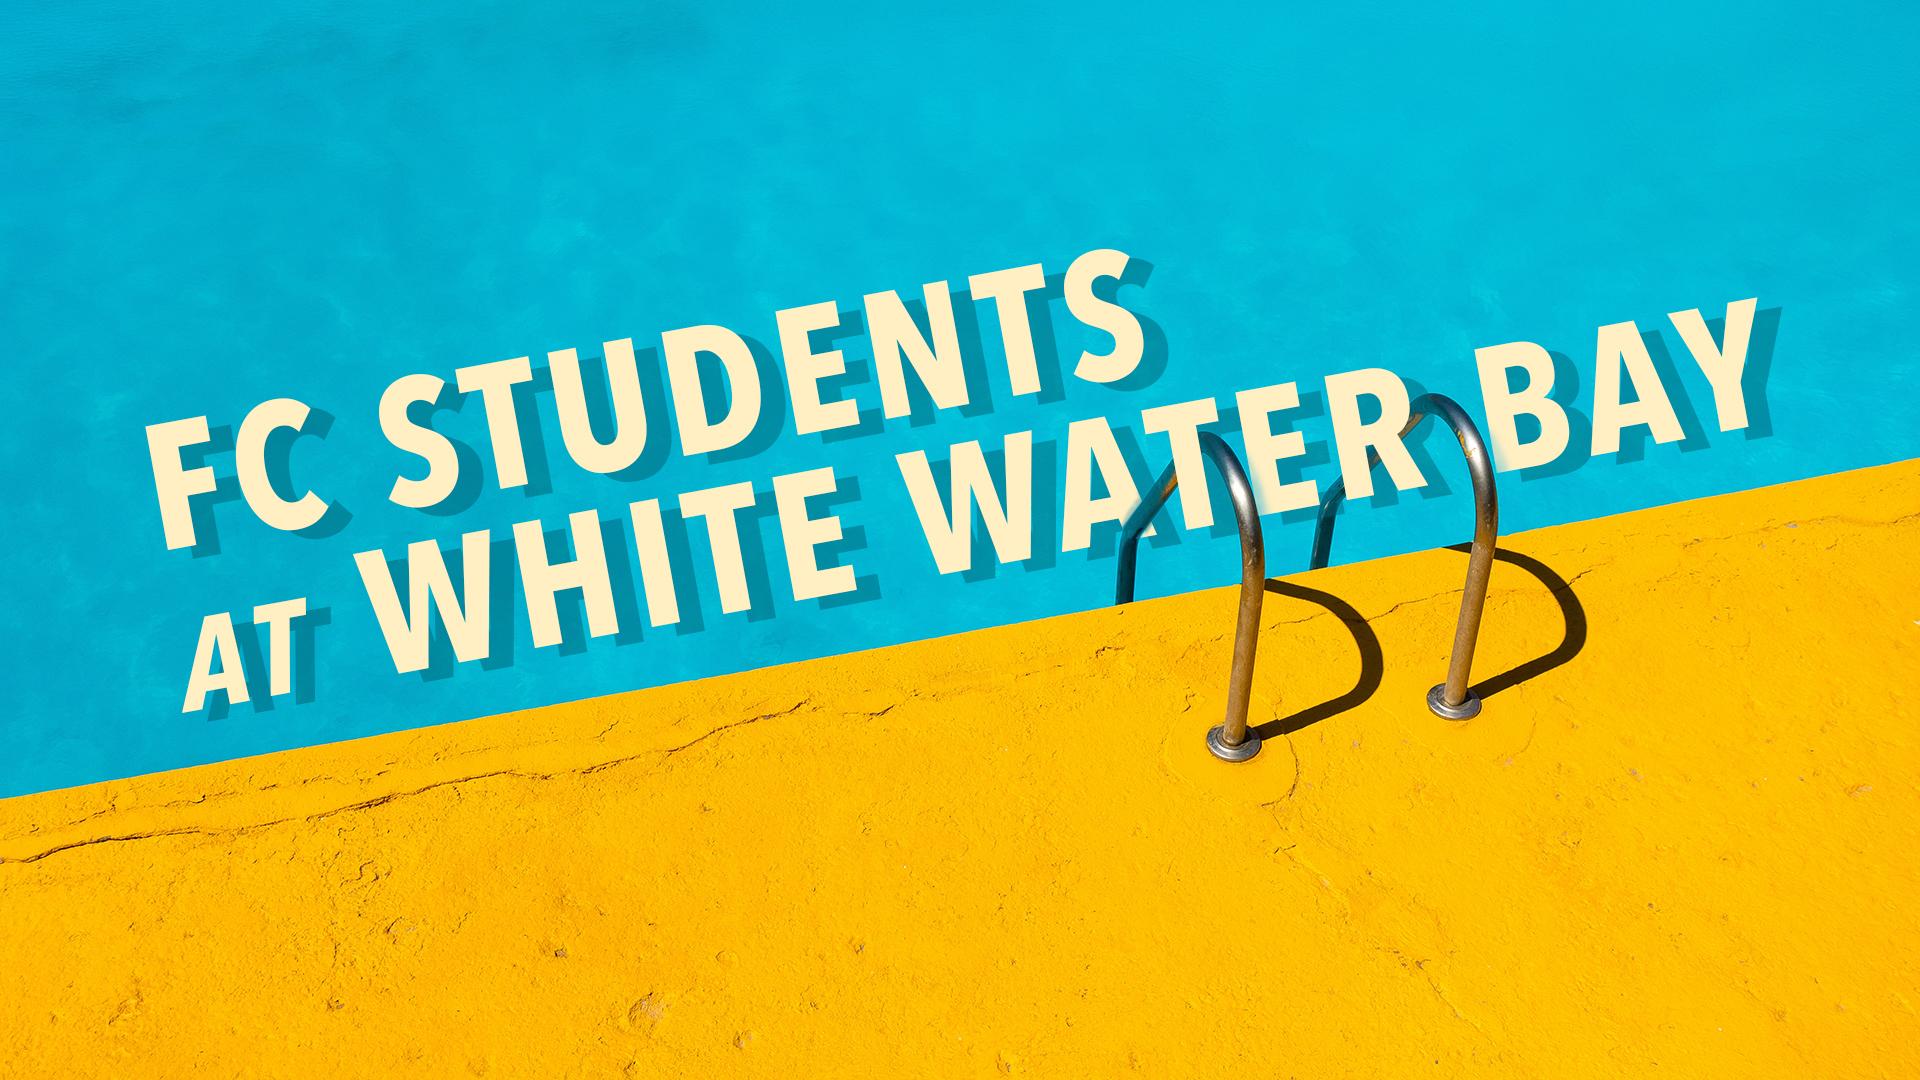 fc students white water 2.jpg